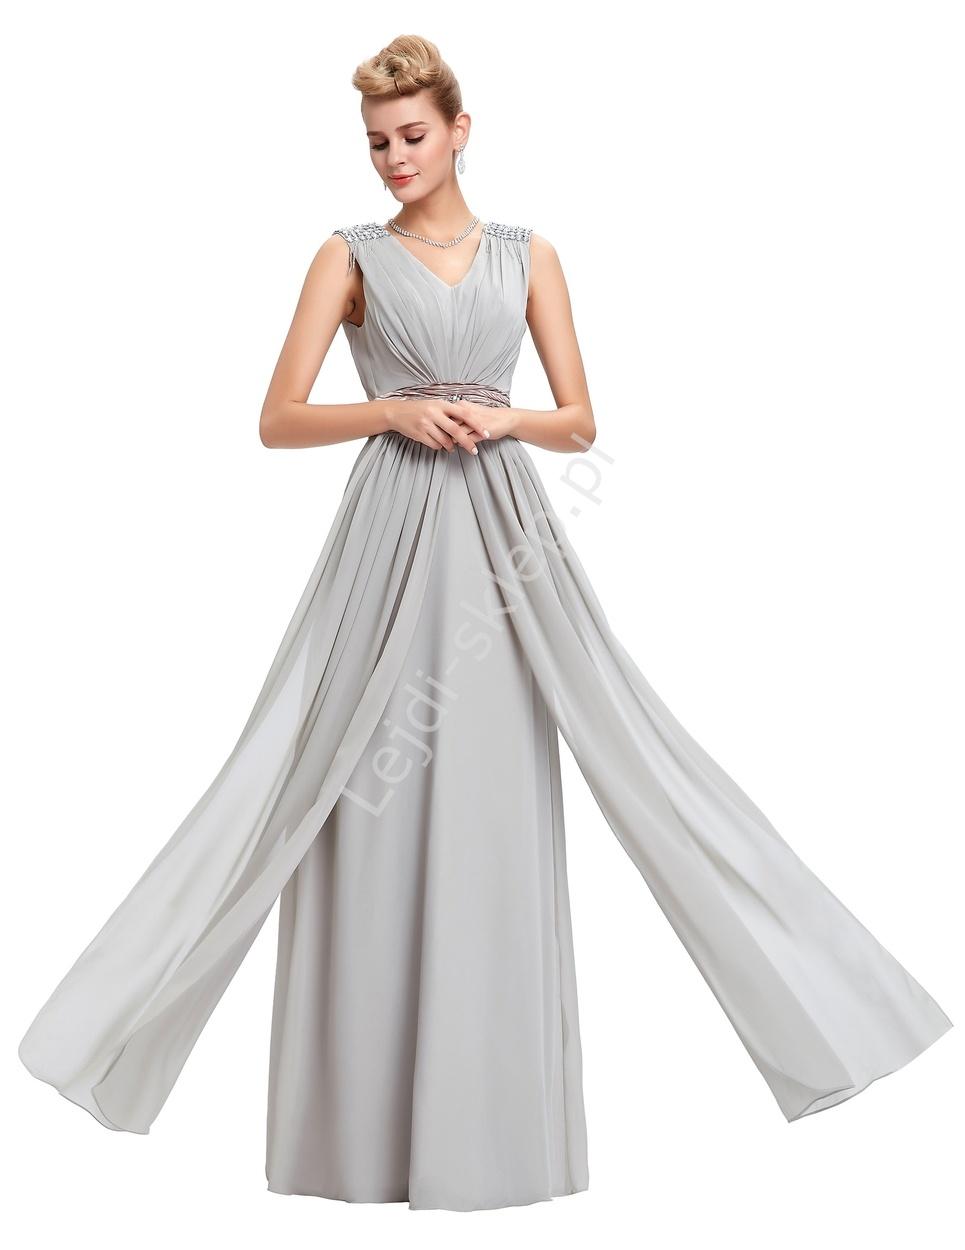 77a383e734 Elegancka szara długa suknia sylwester   studniówka